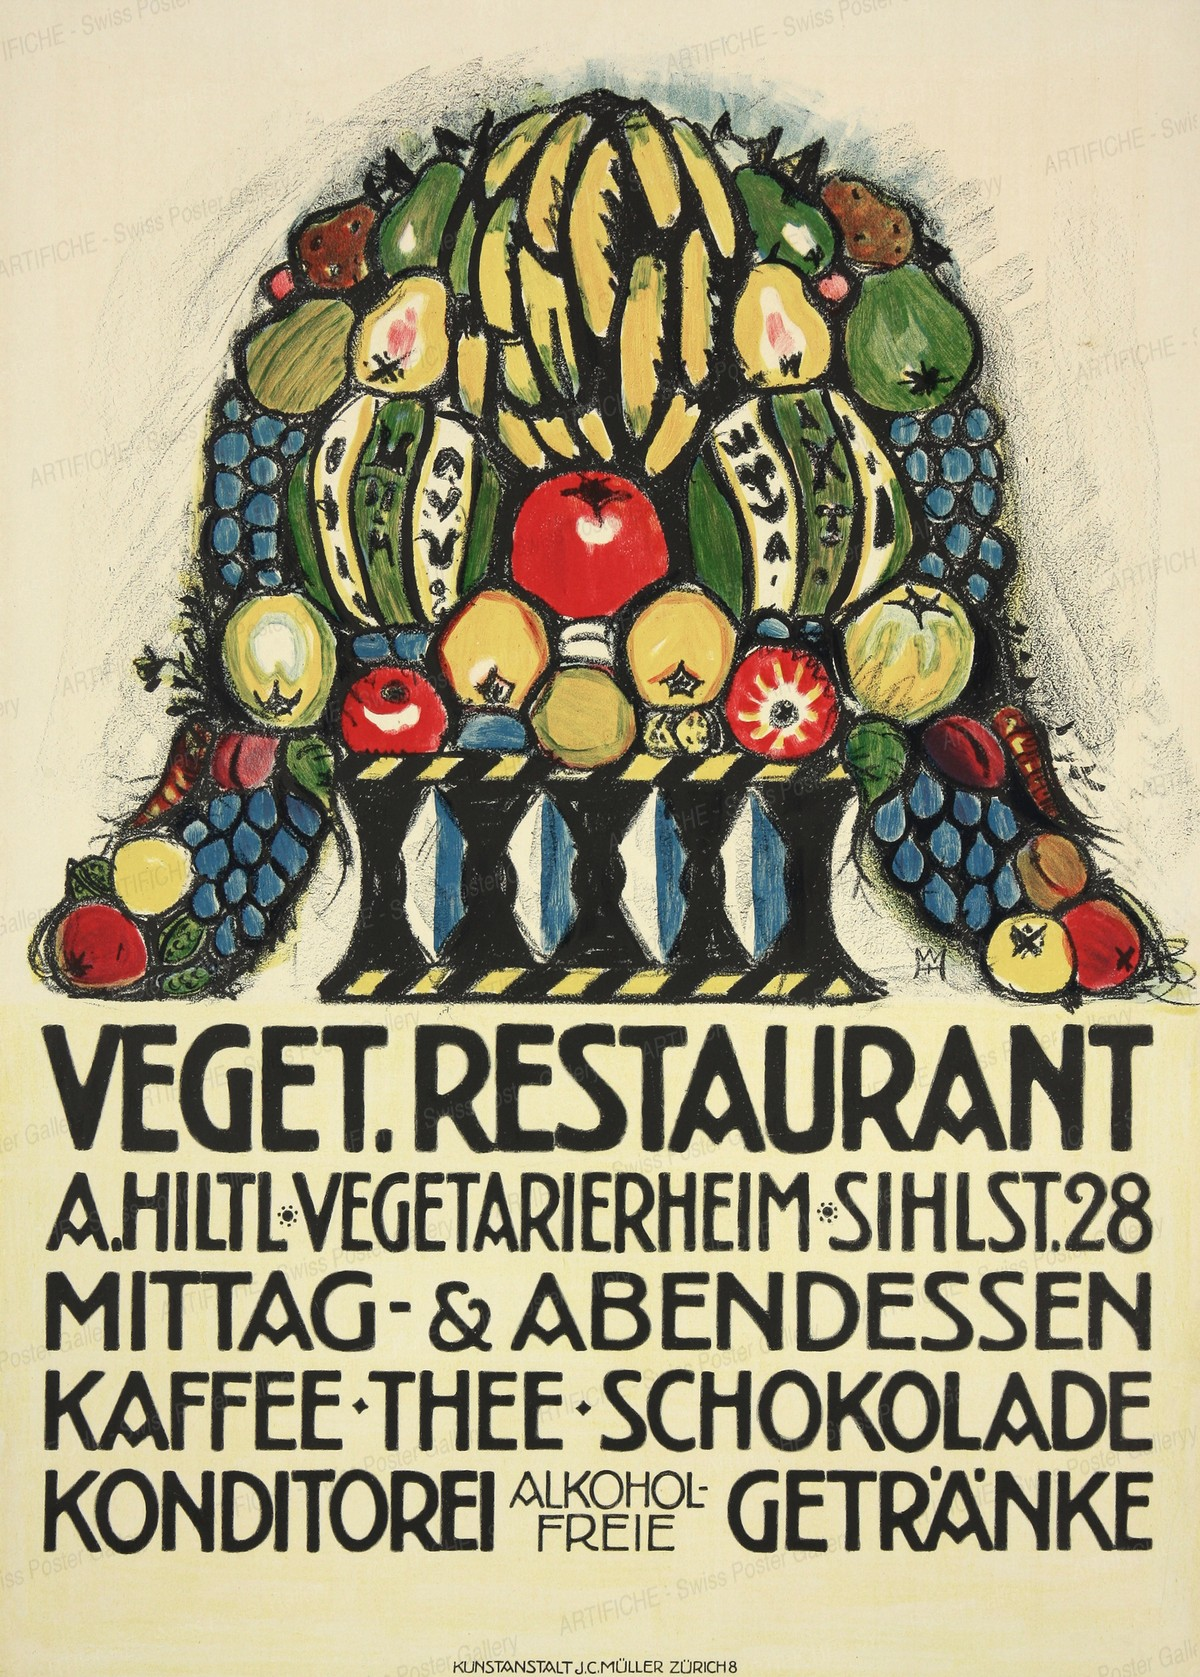 Veget. Restaurant – A. HILTL – Vegetarierheim – Sihlstr. 28, Wilhelm Hartung